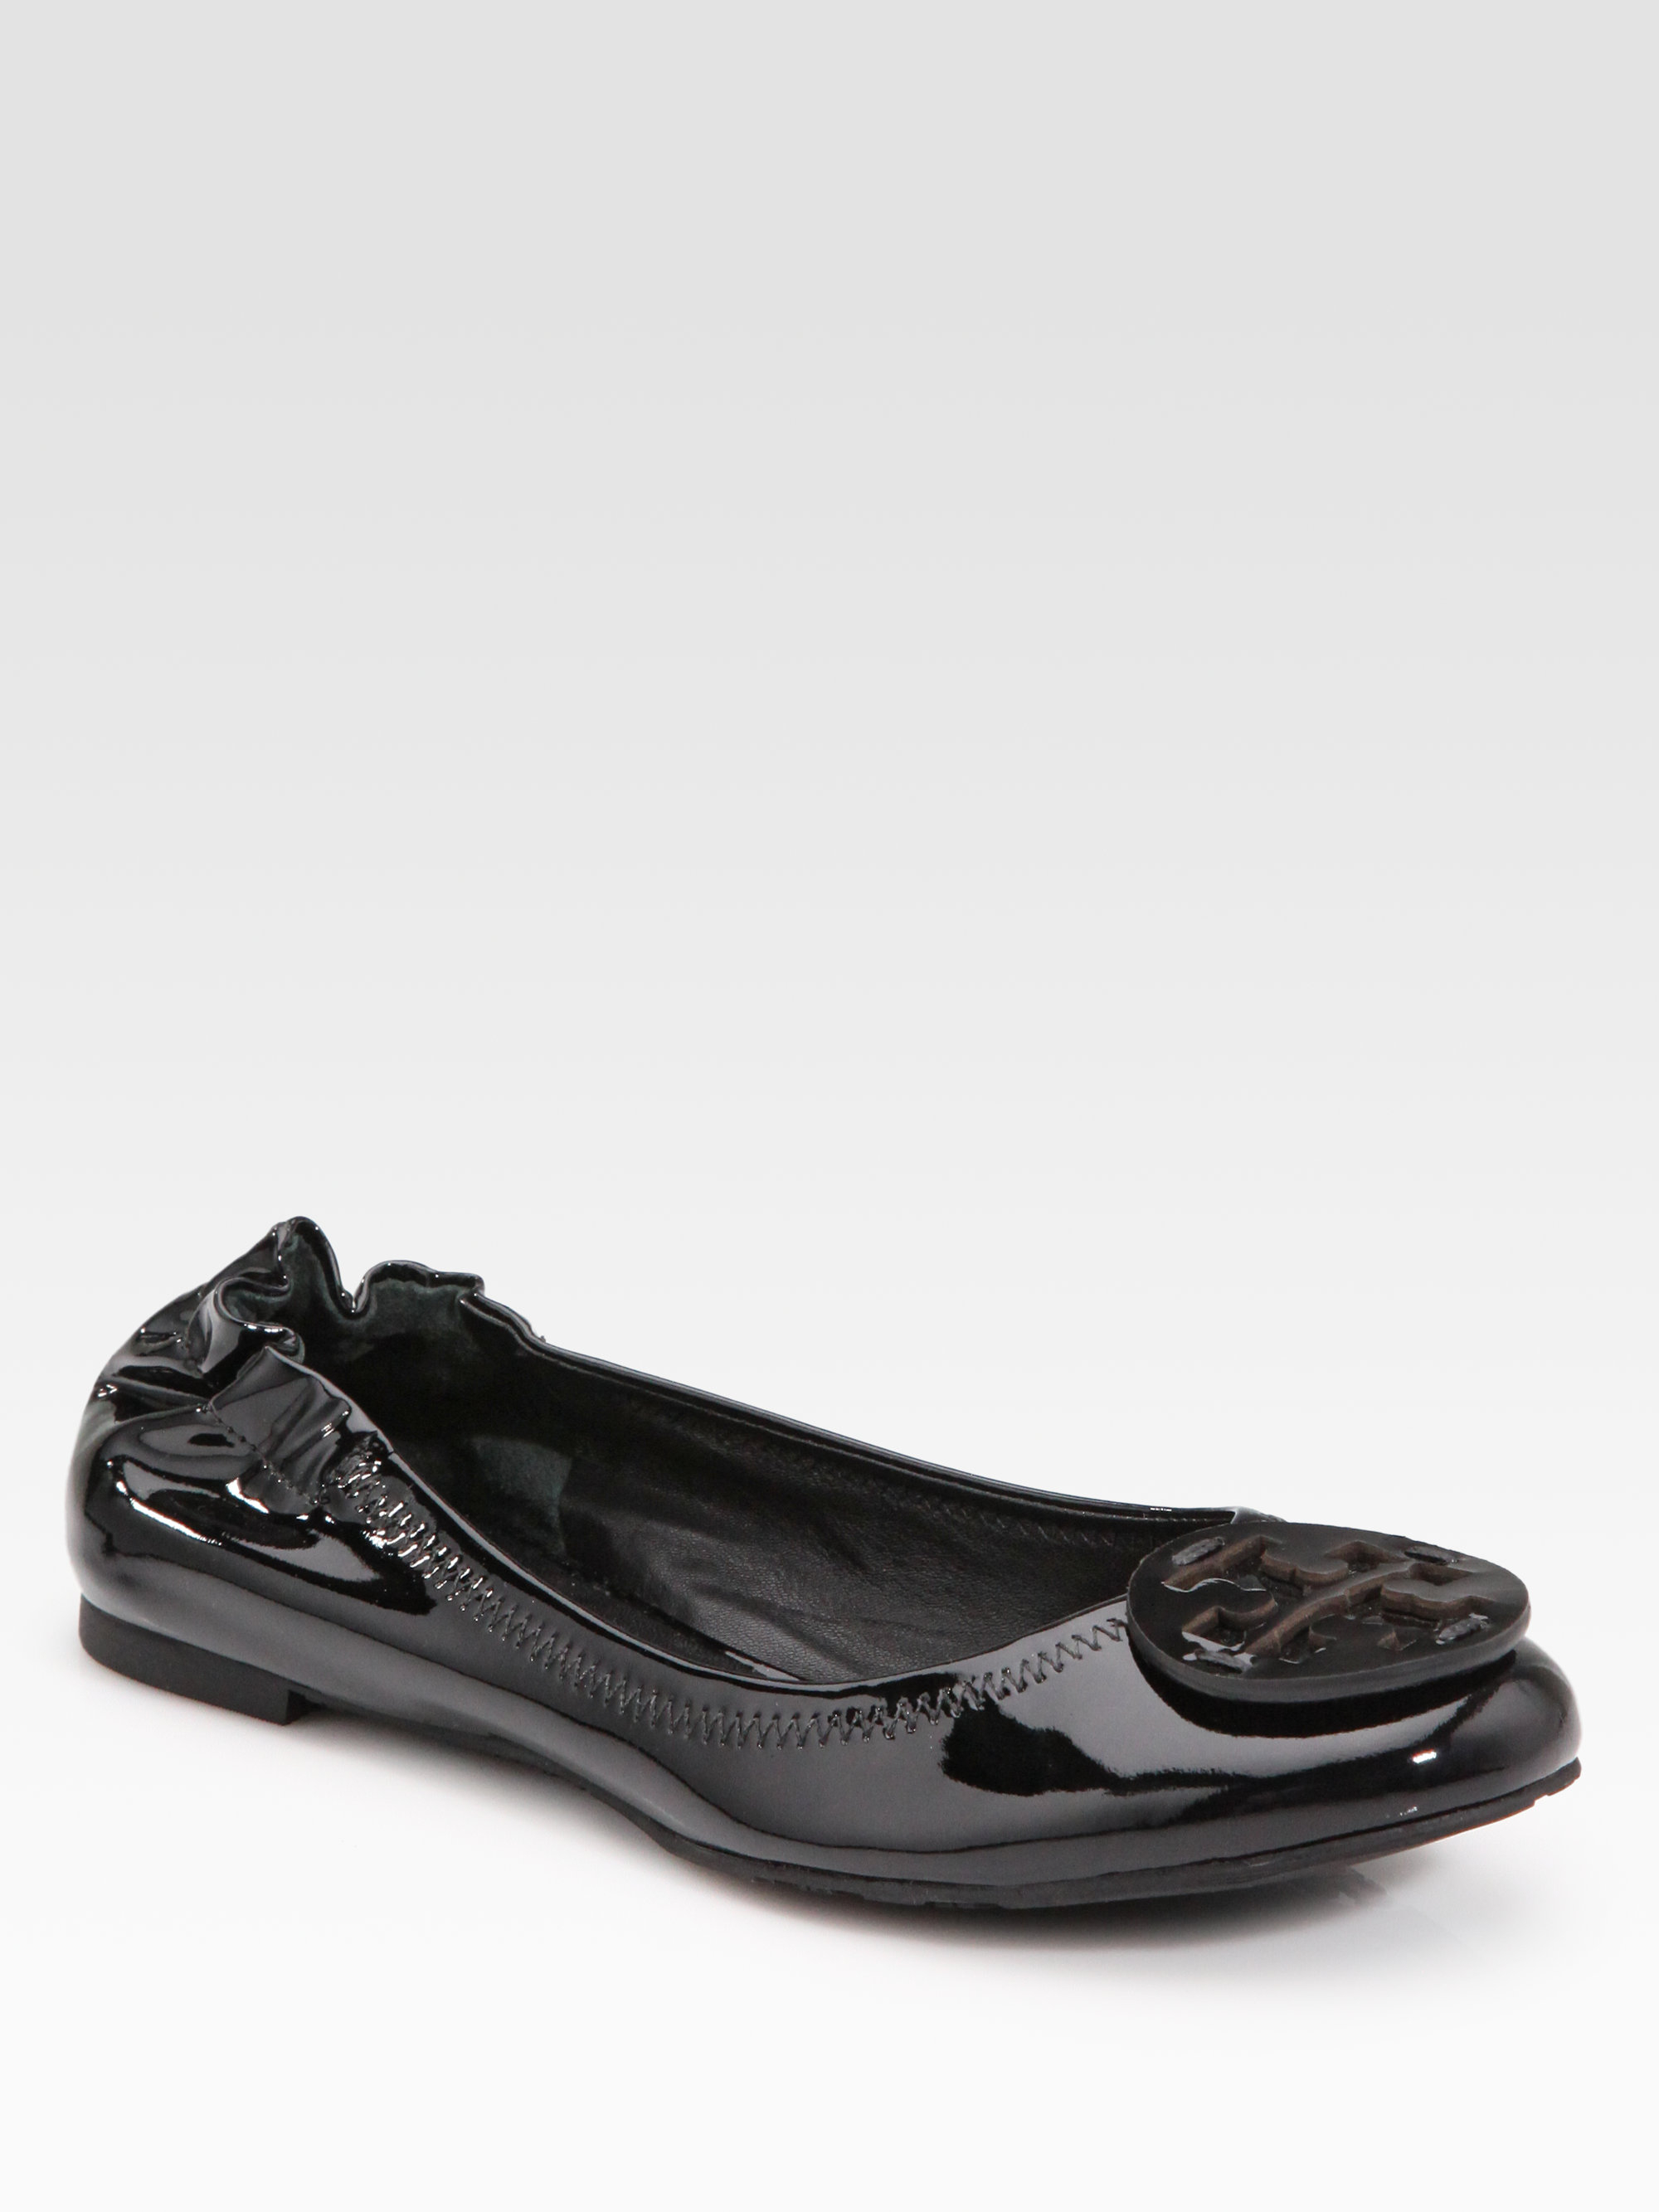 21c2e602b ... new zealand lyst tory burch reva patent leather ballet flats in black  60fd9 ec829